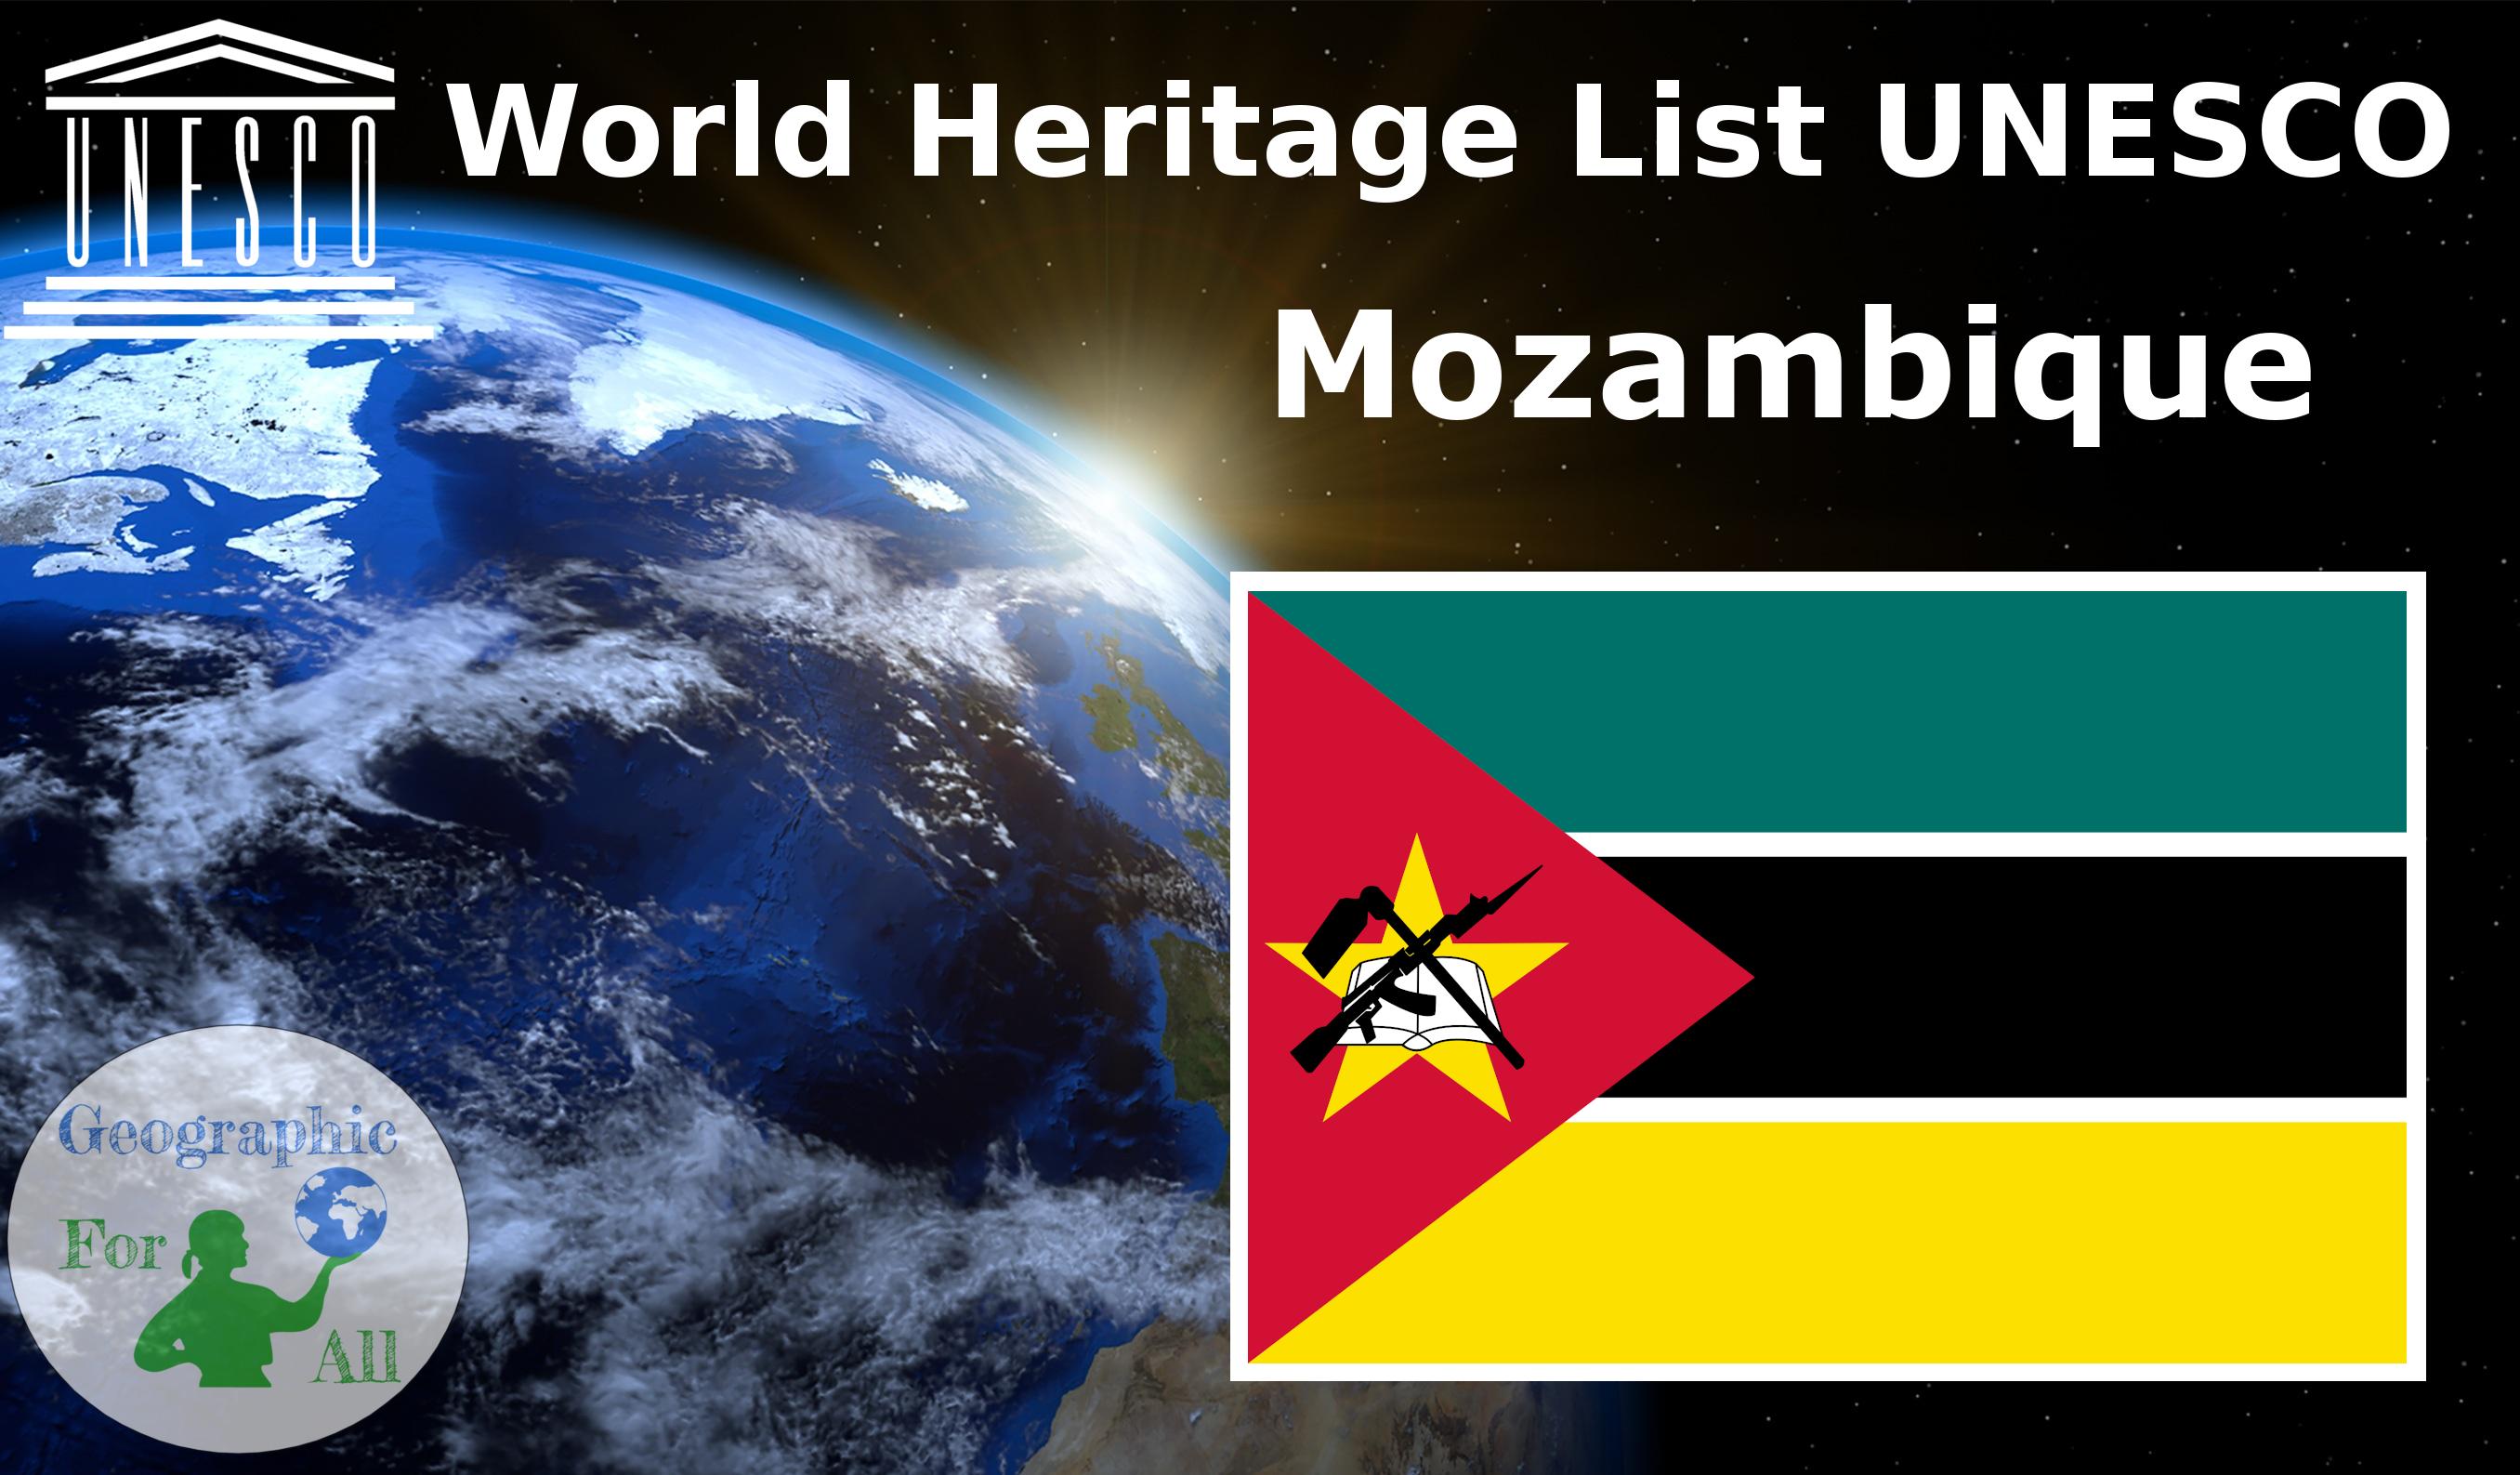 World Heritage List UNESCO - Mozambique